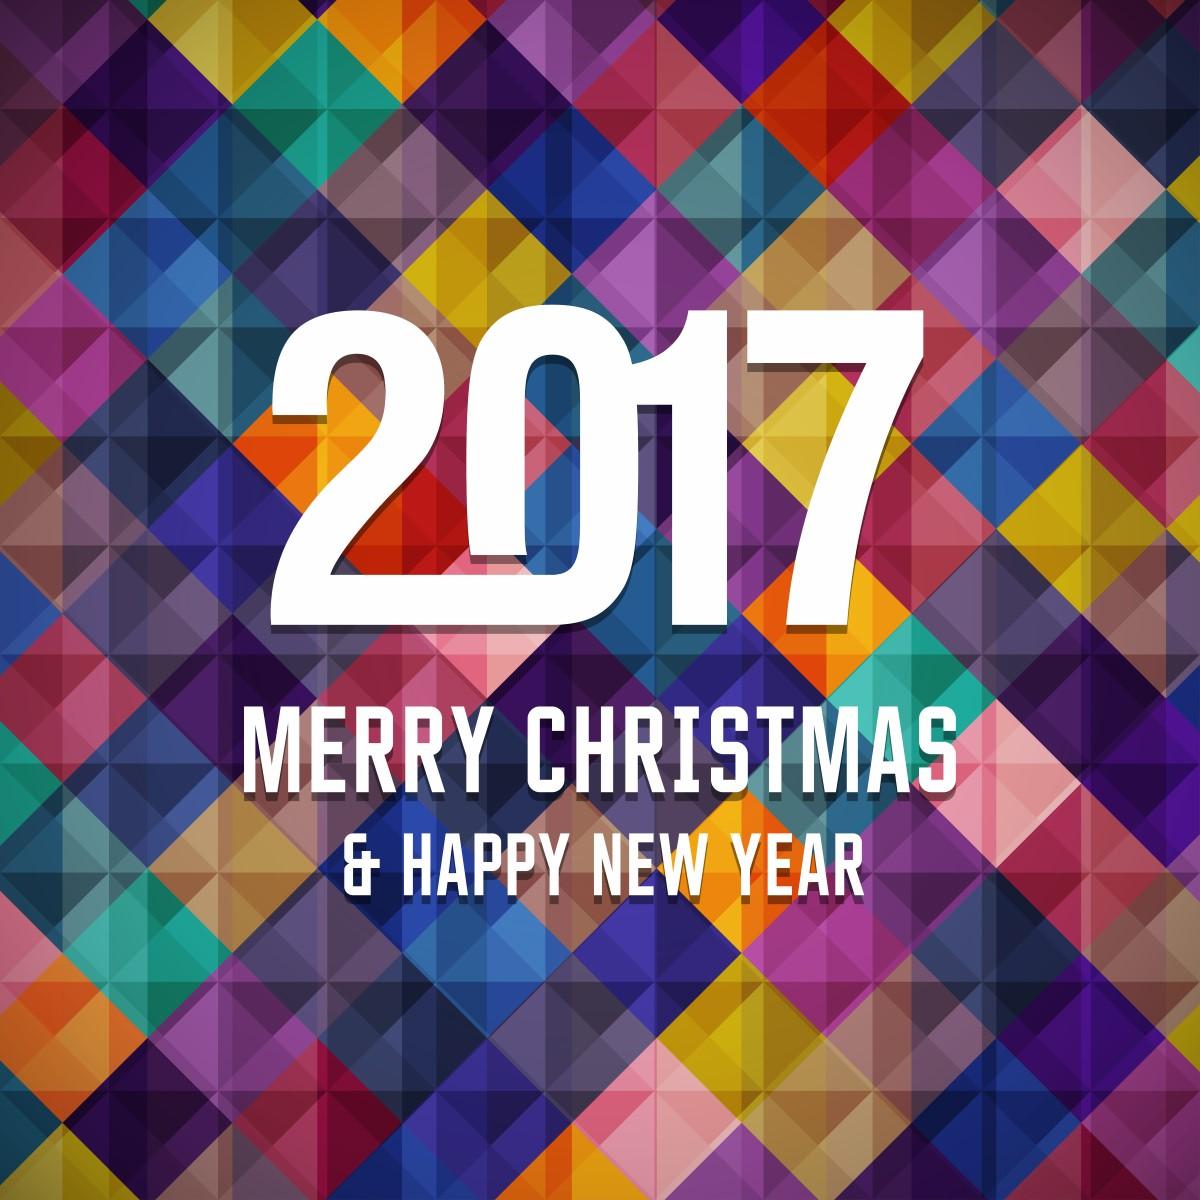 Happy New Year 2017 Status In Hindi